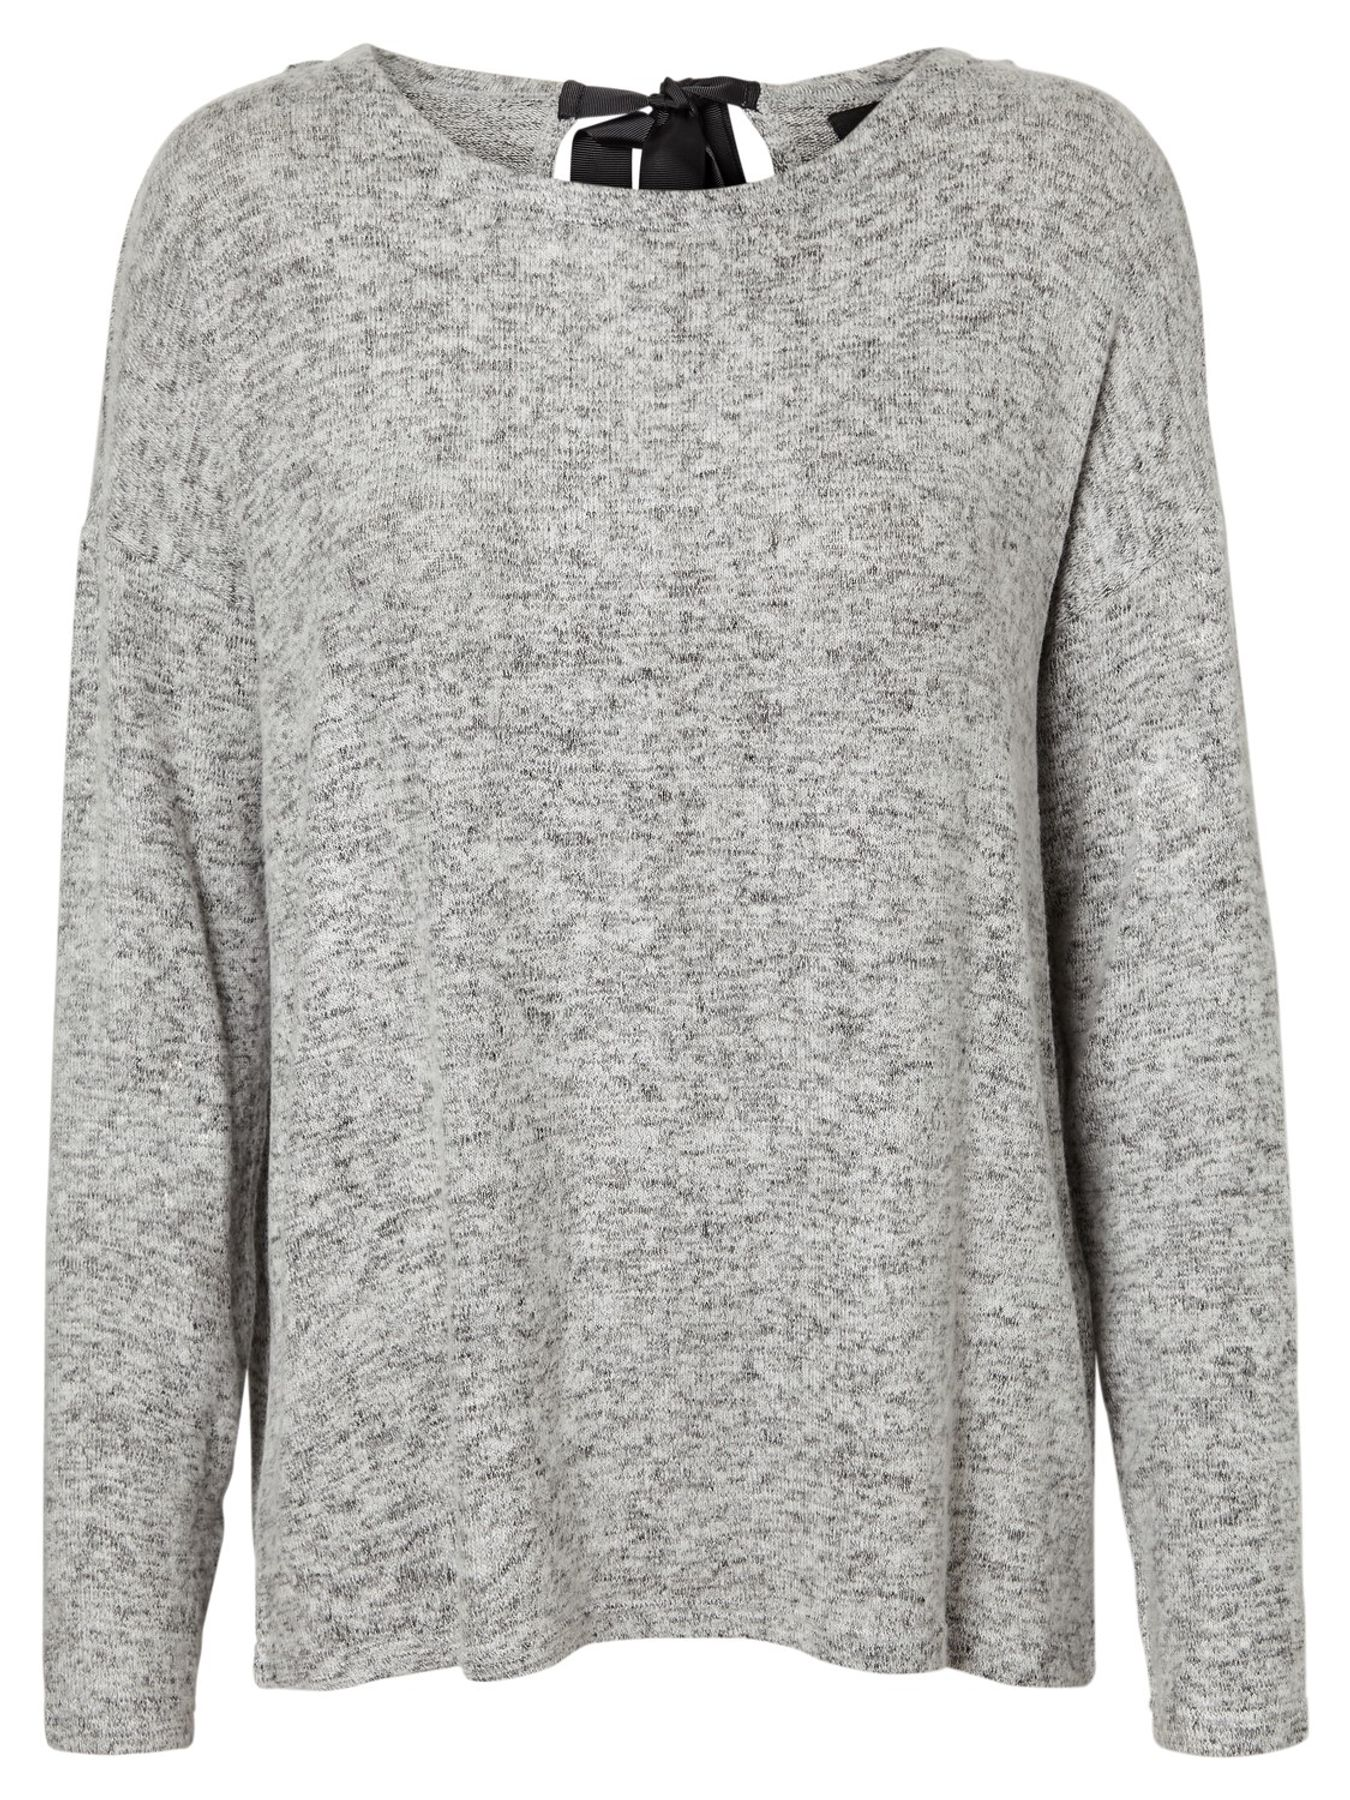 VERO MODA - Damen Langarm Pullover, VMCIMA LS TIEBACK BLOUSE (10205026) – Bild 1